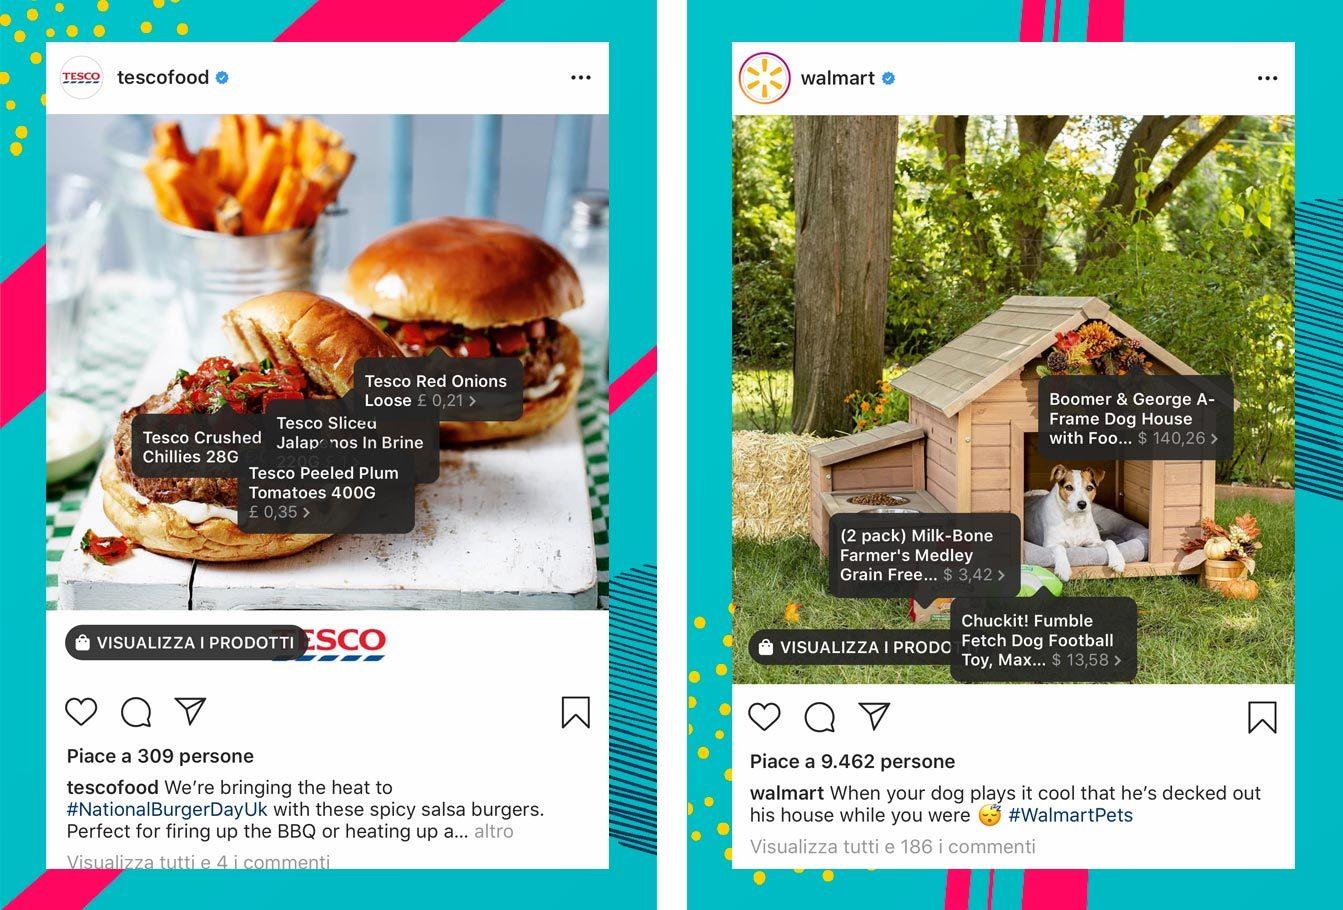 Esempi Instagram Shopping grande distribuzione